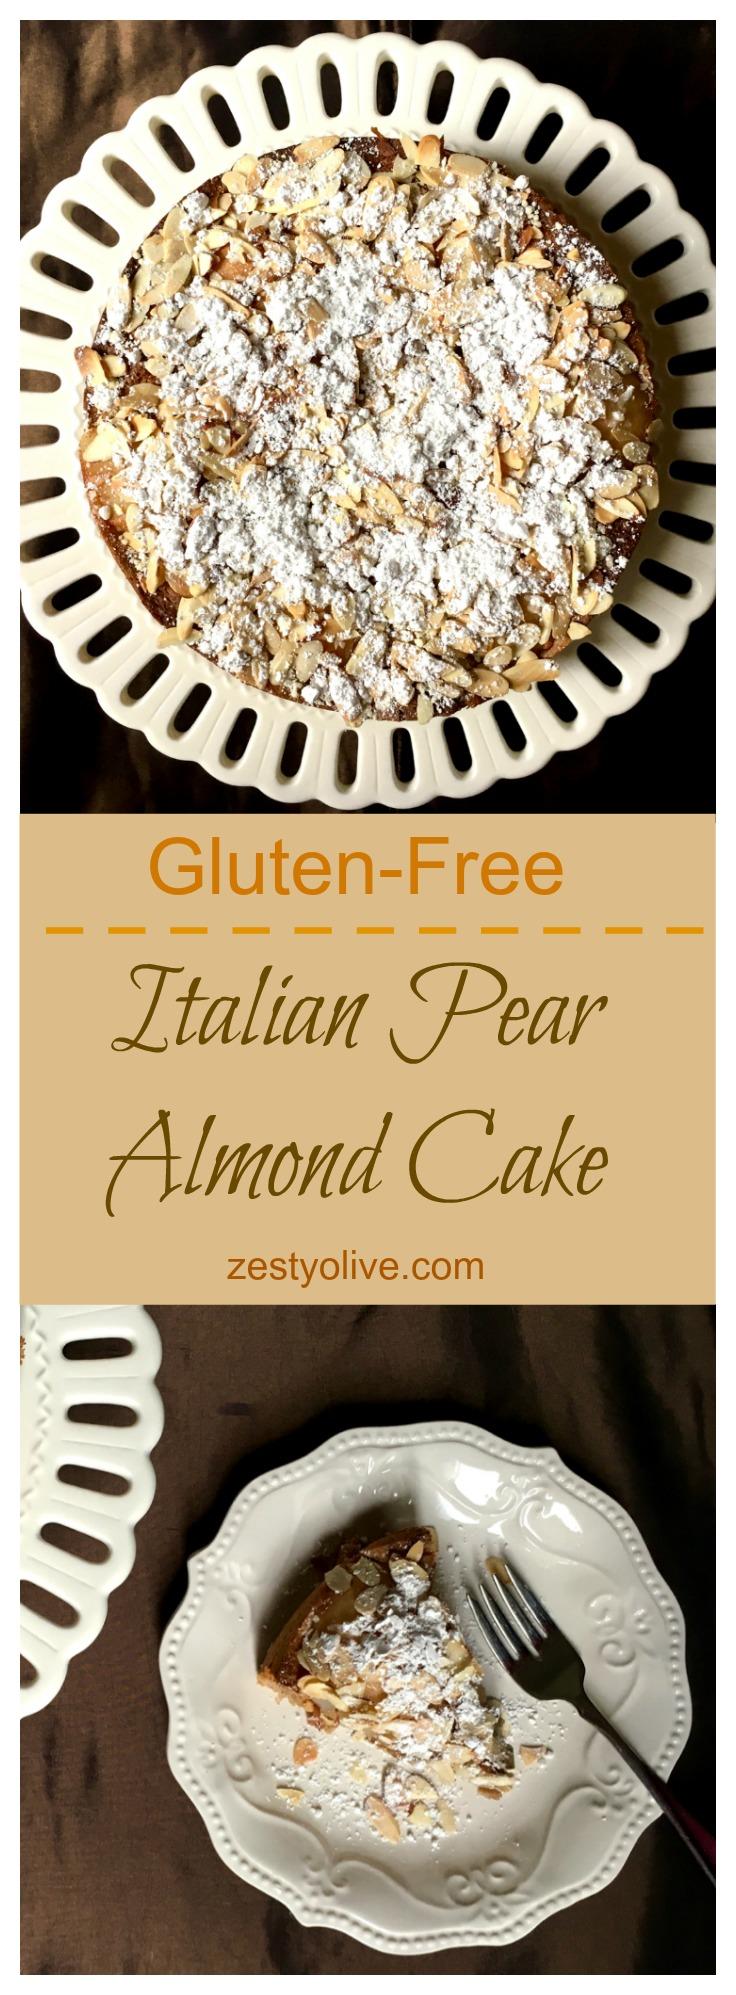 Italian Pear Almond Cake Gluten-Free